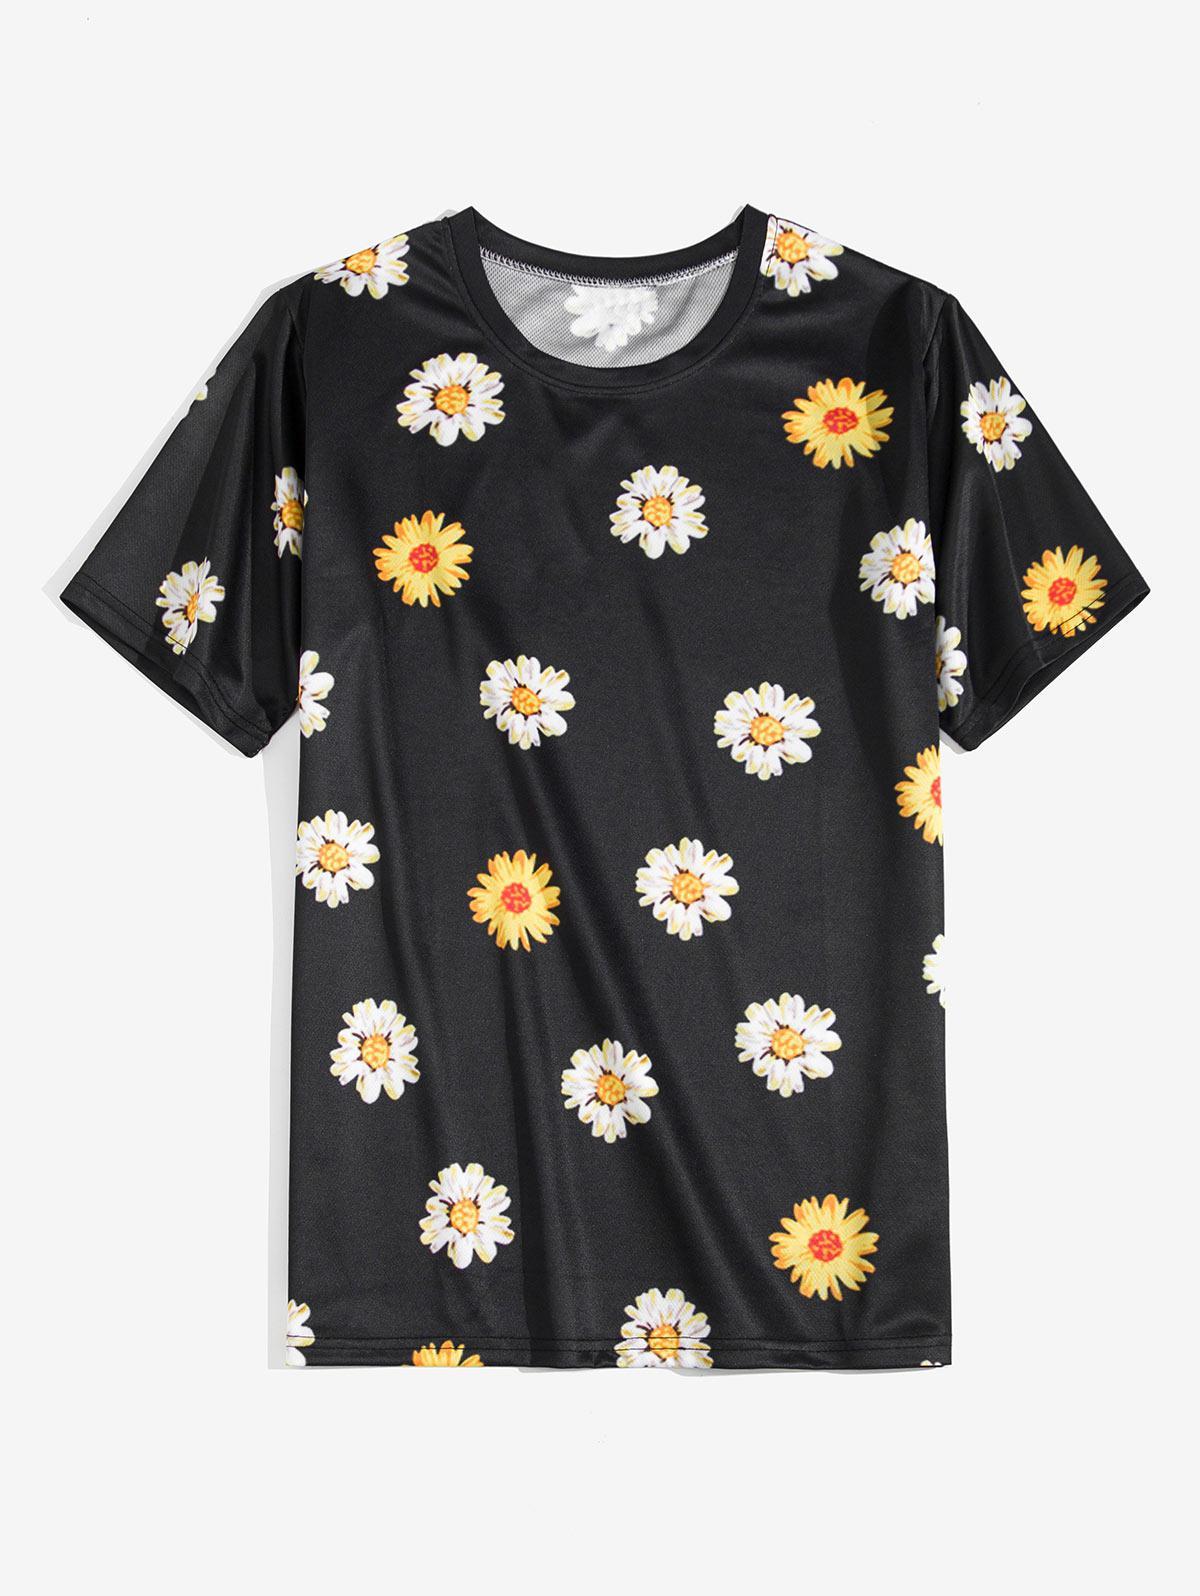 Daisy Flower Print Short Sleeve T-shirt фото